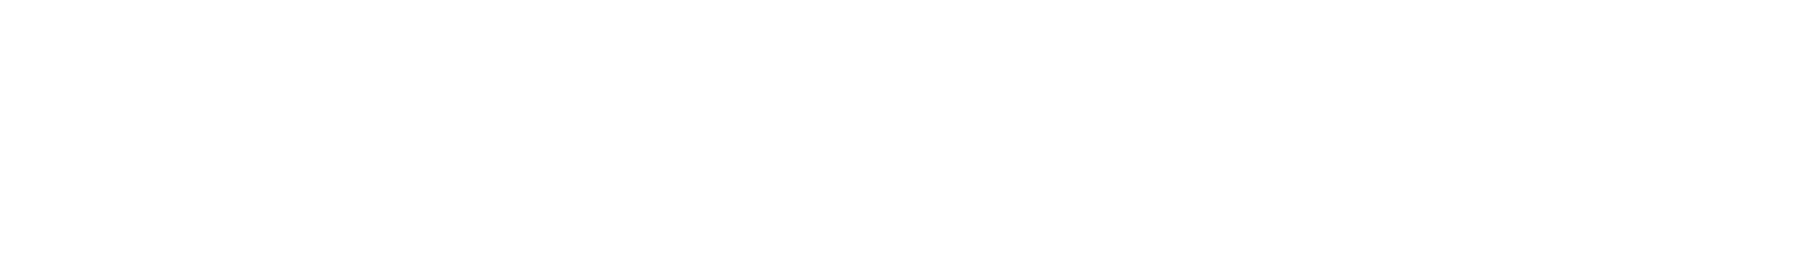 simple beat 1